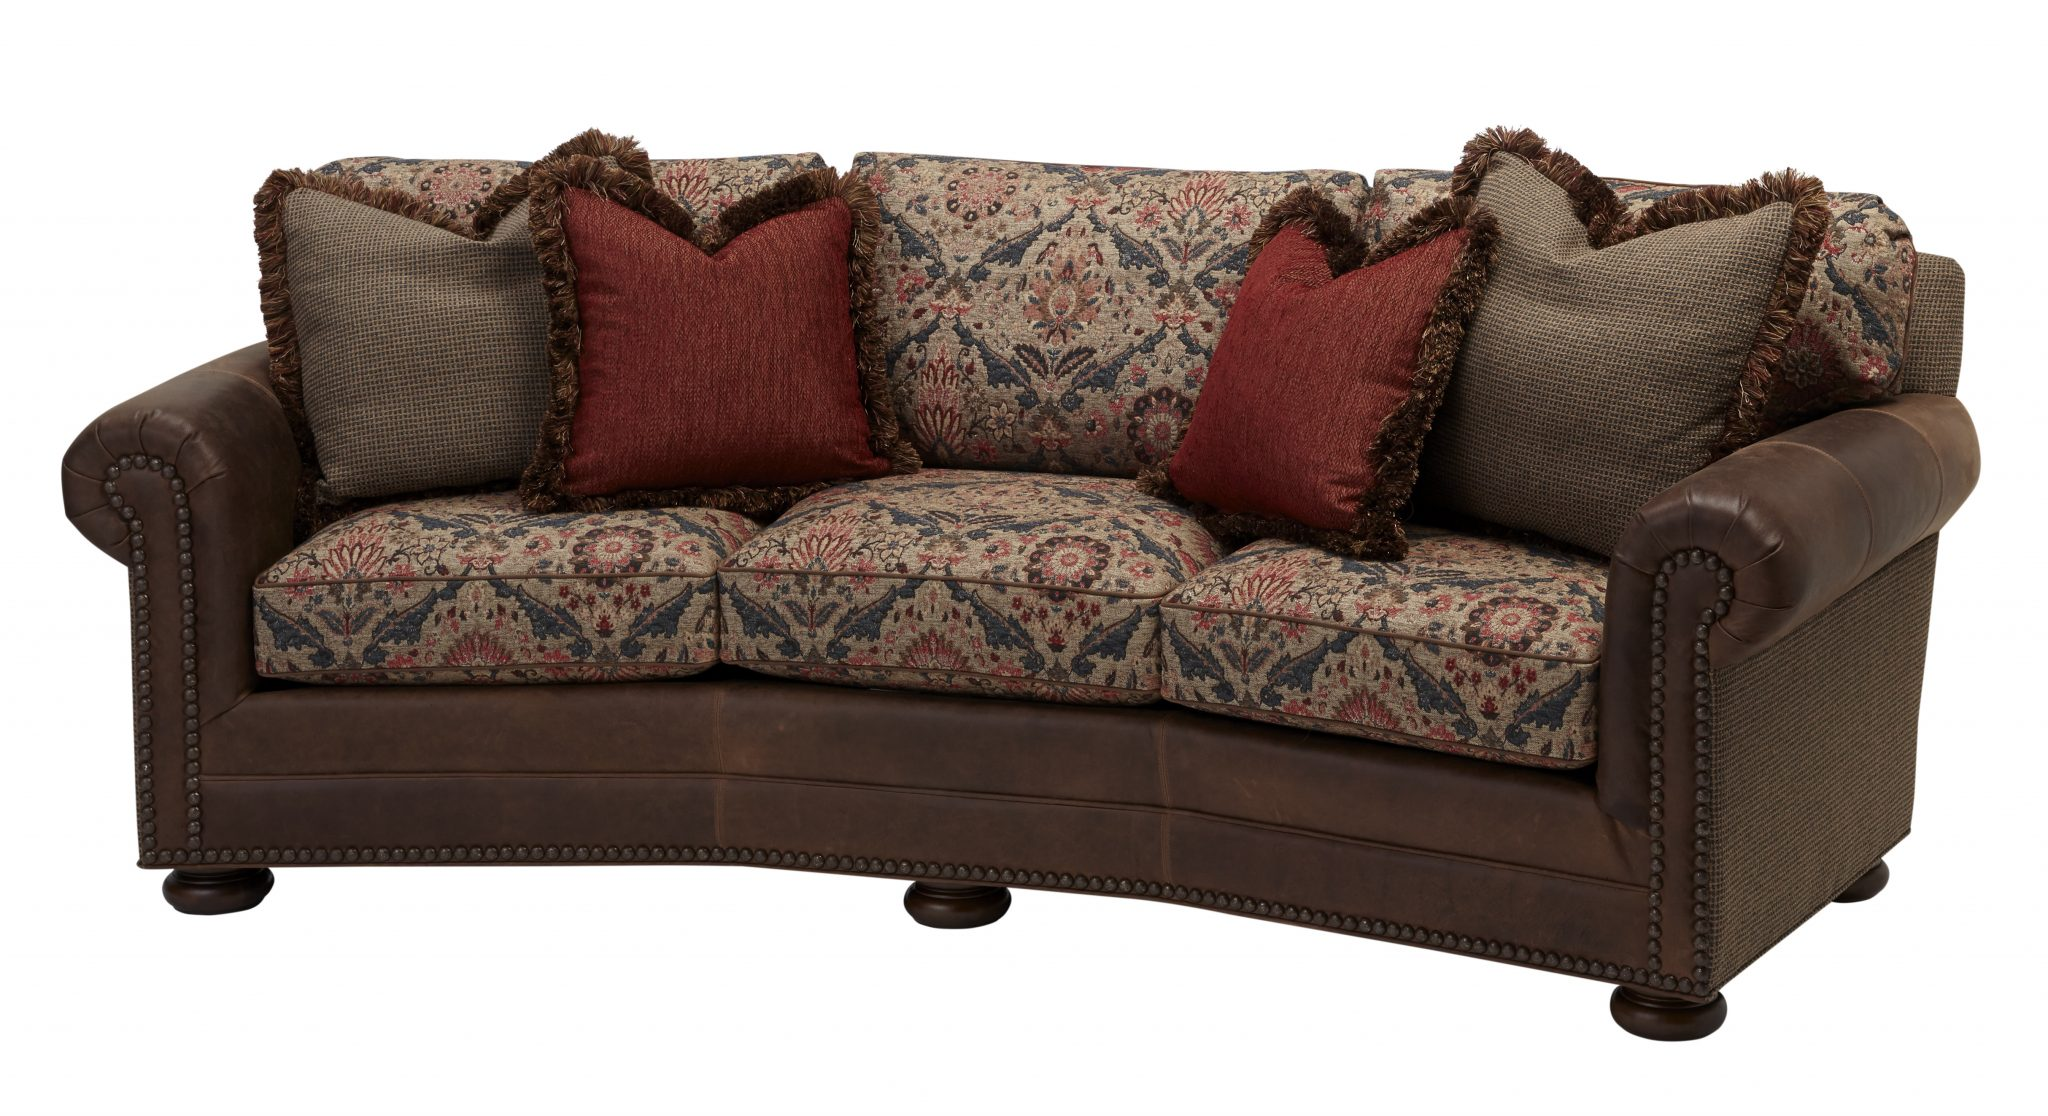 learn cupboard lexington cushion need now to merlot you three furniture tips massoud sofas